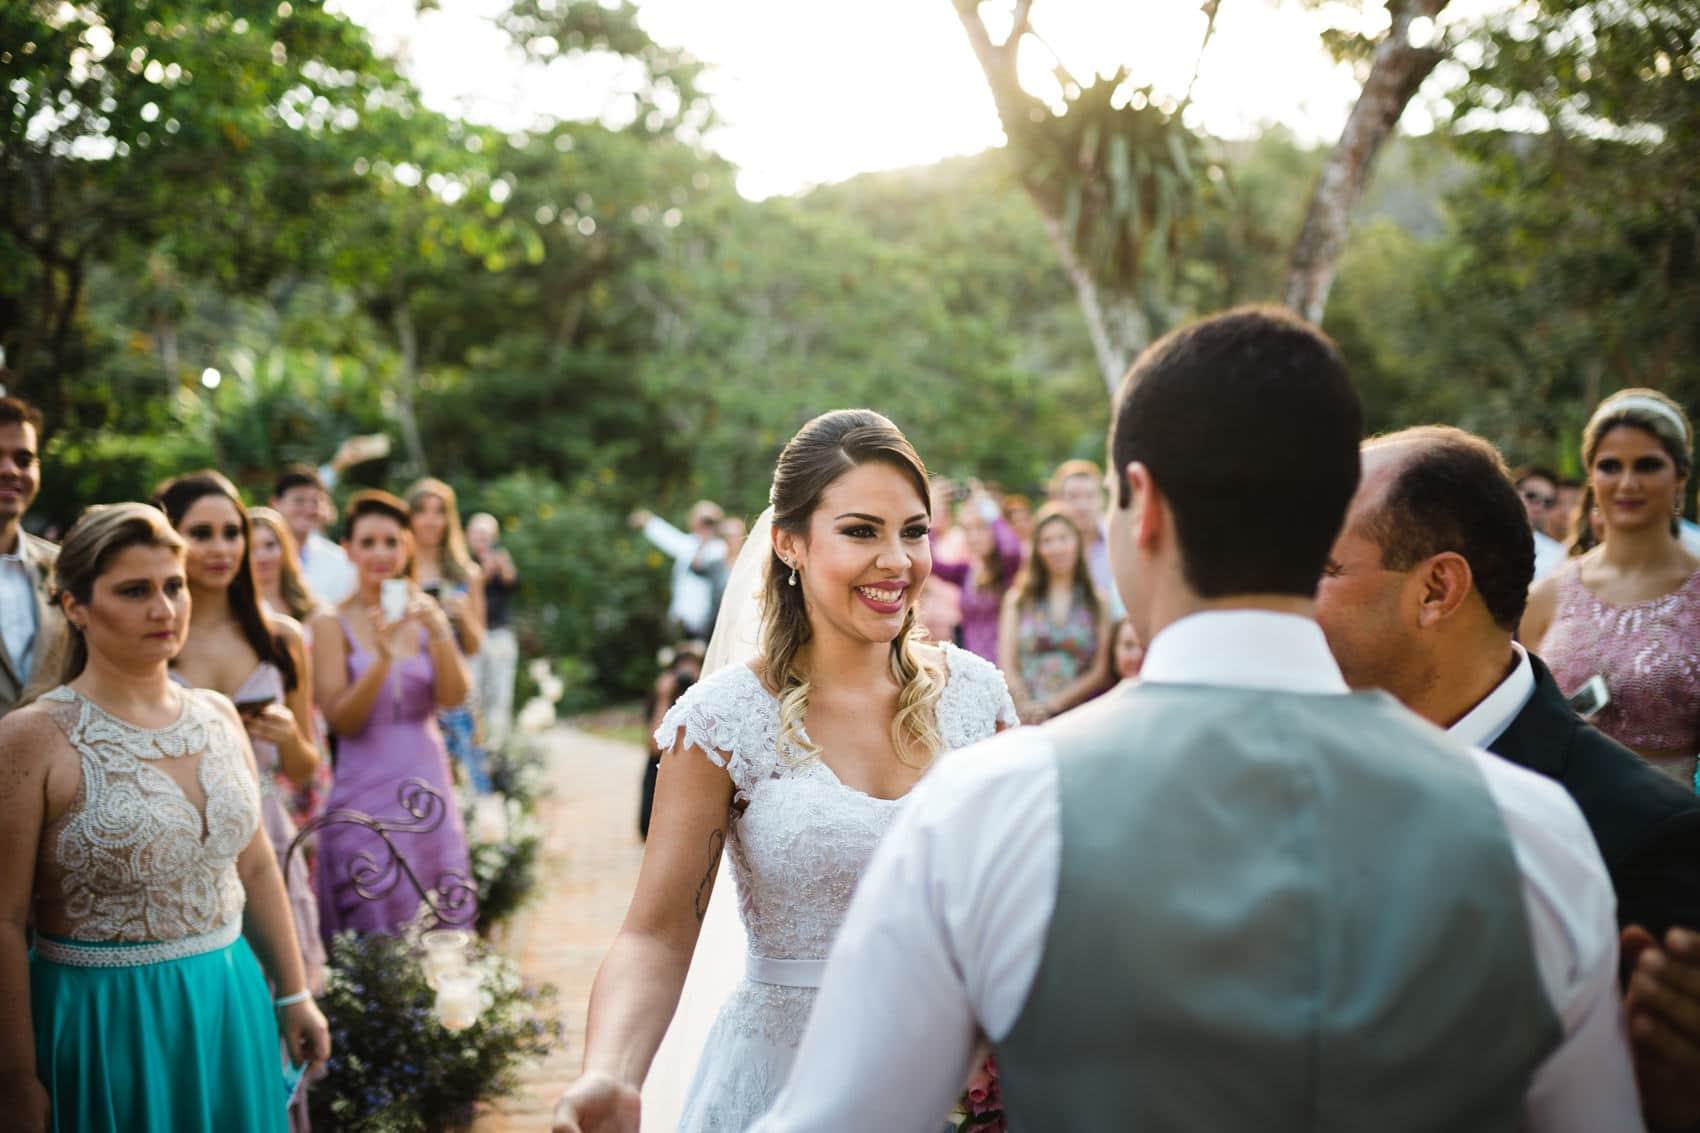 casamento-sitio-serra-guaramiranga-31